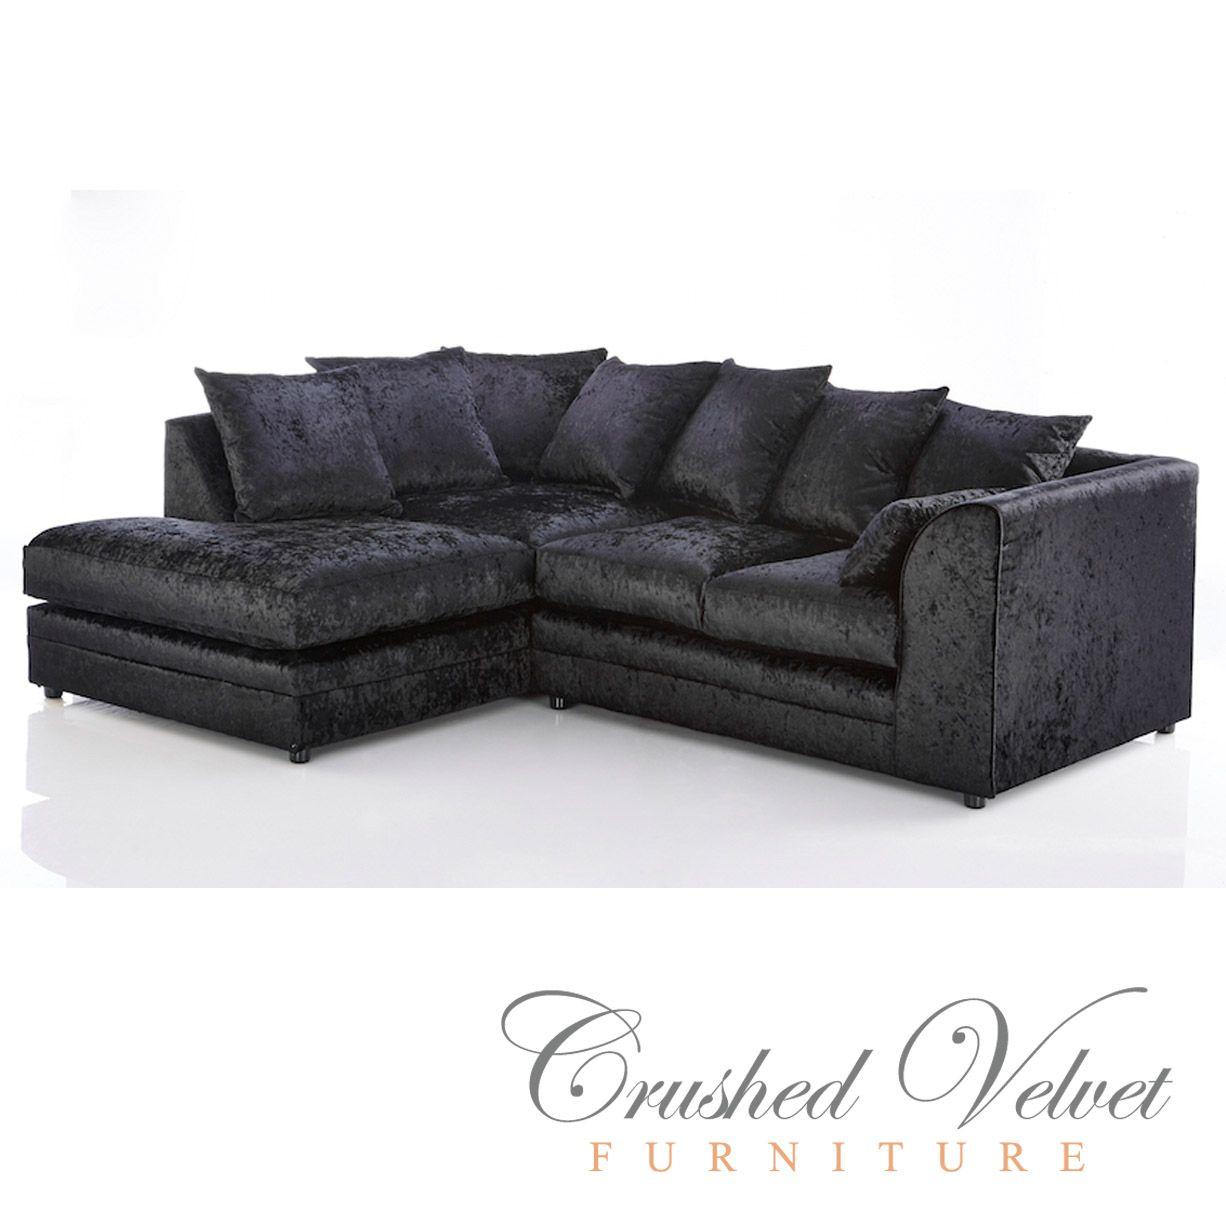 Michigan, Crushed Velvet, 4 Seater Sofa, Black, Left Hand Corner Sofa